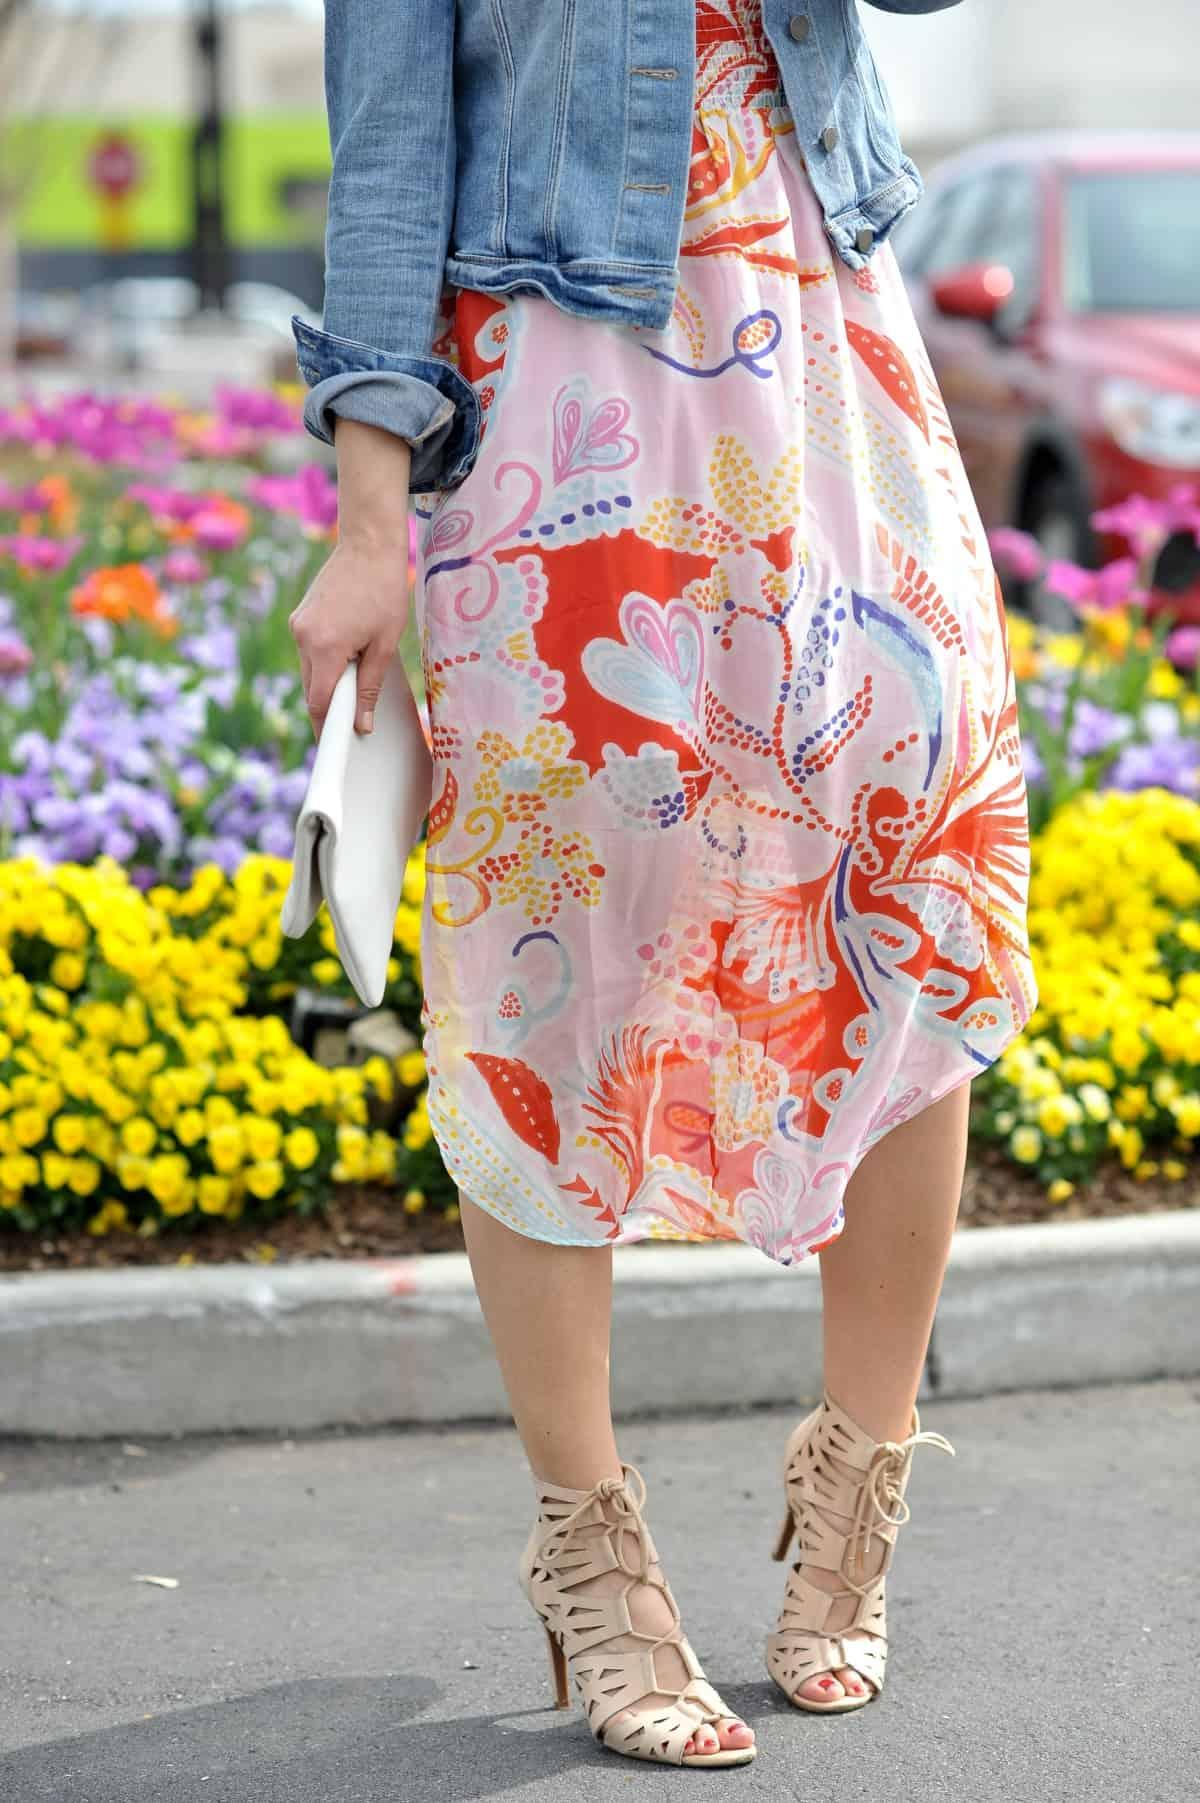 Banjanan Cochella Dress - printed floral dress for summer - My Style Vita - @mystylevita - 16